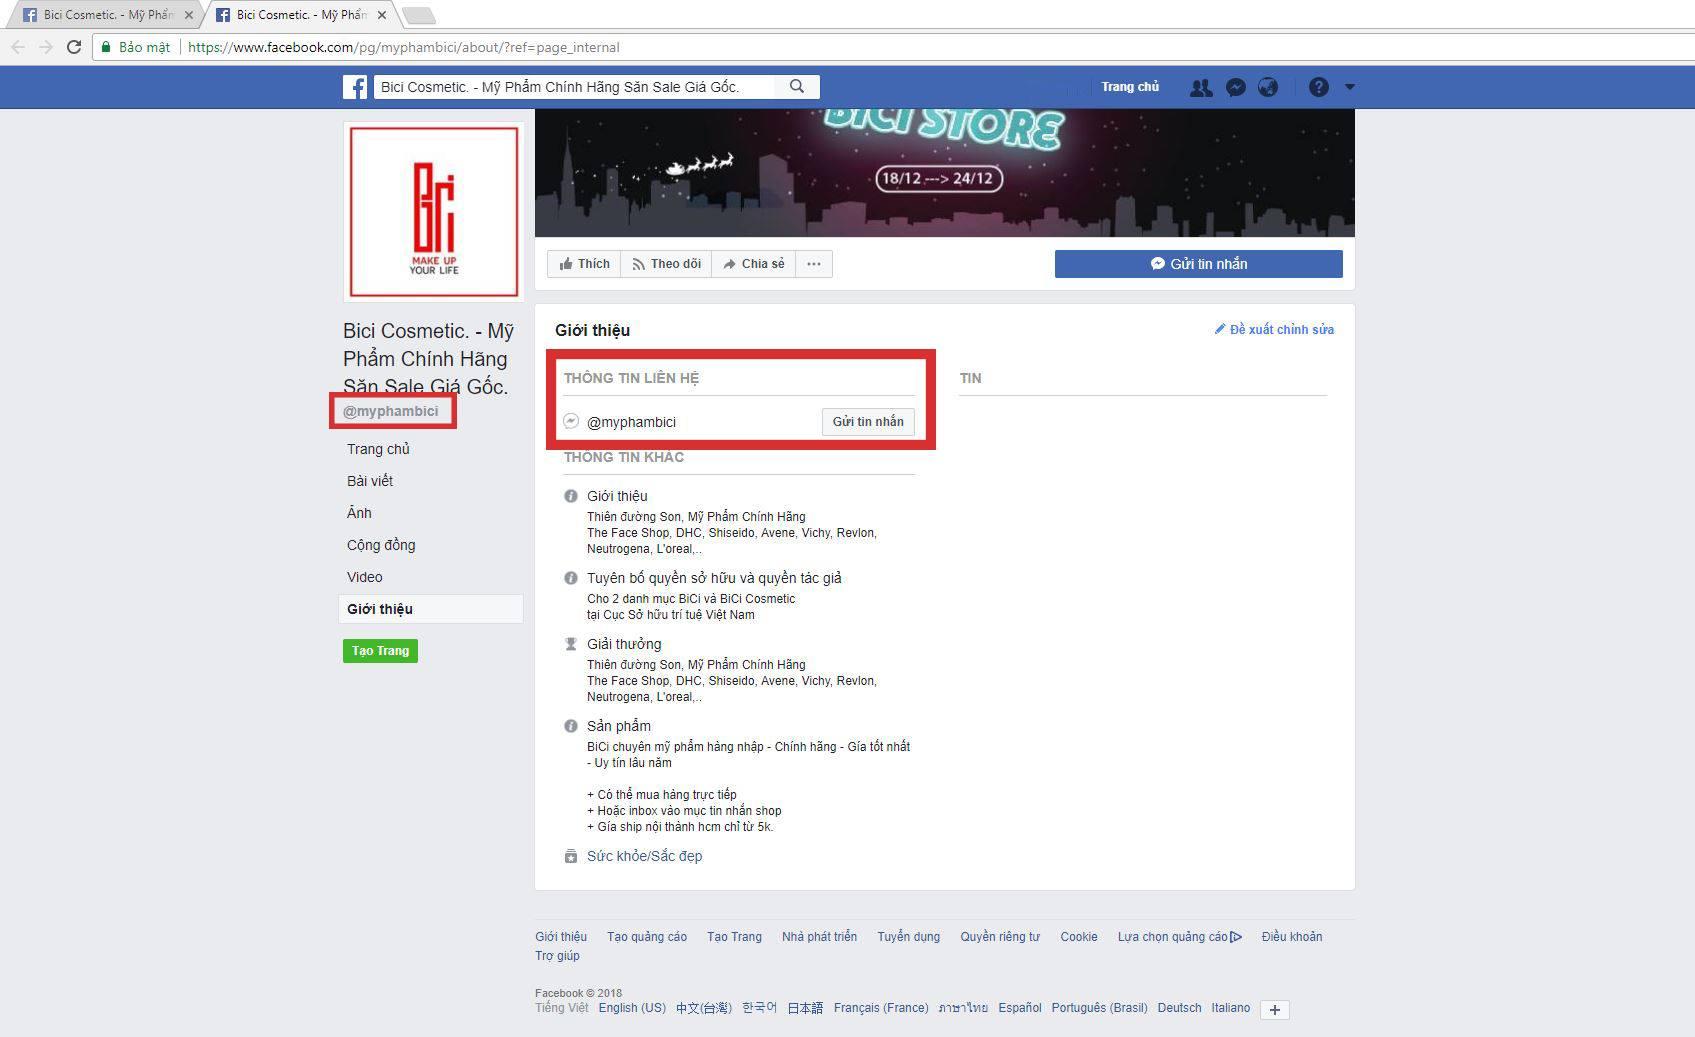 Facebook Giả Mạo Bici Cosmetic 2 1